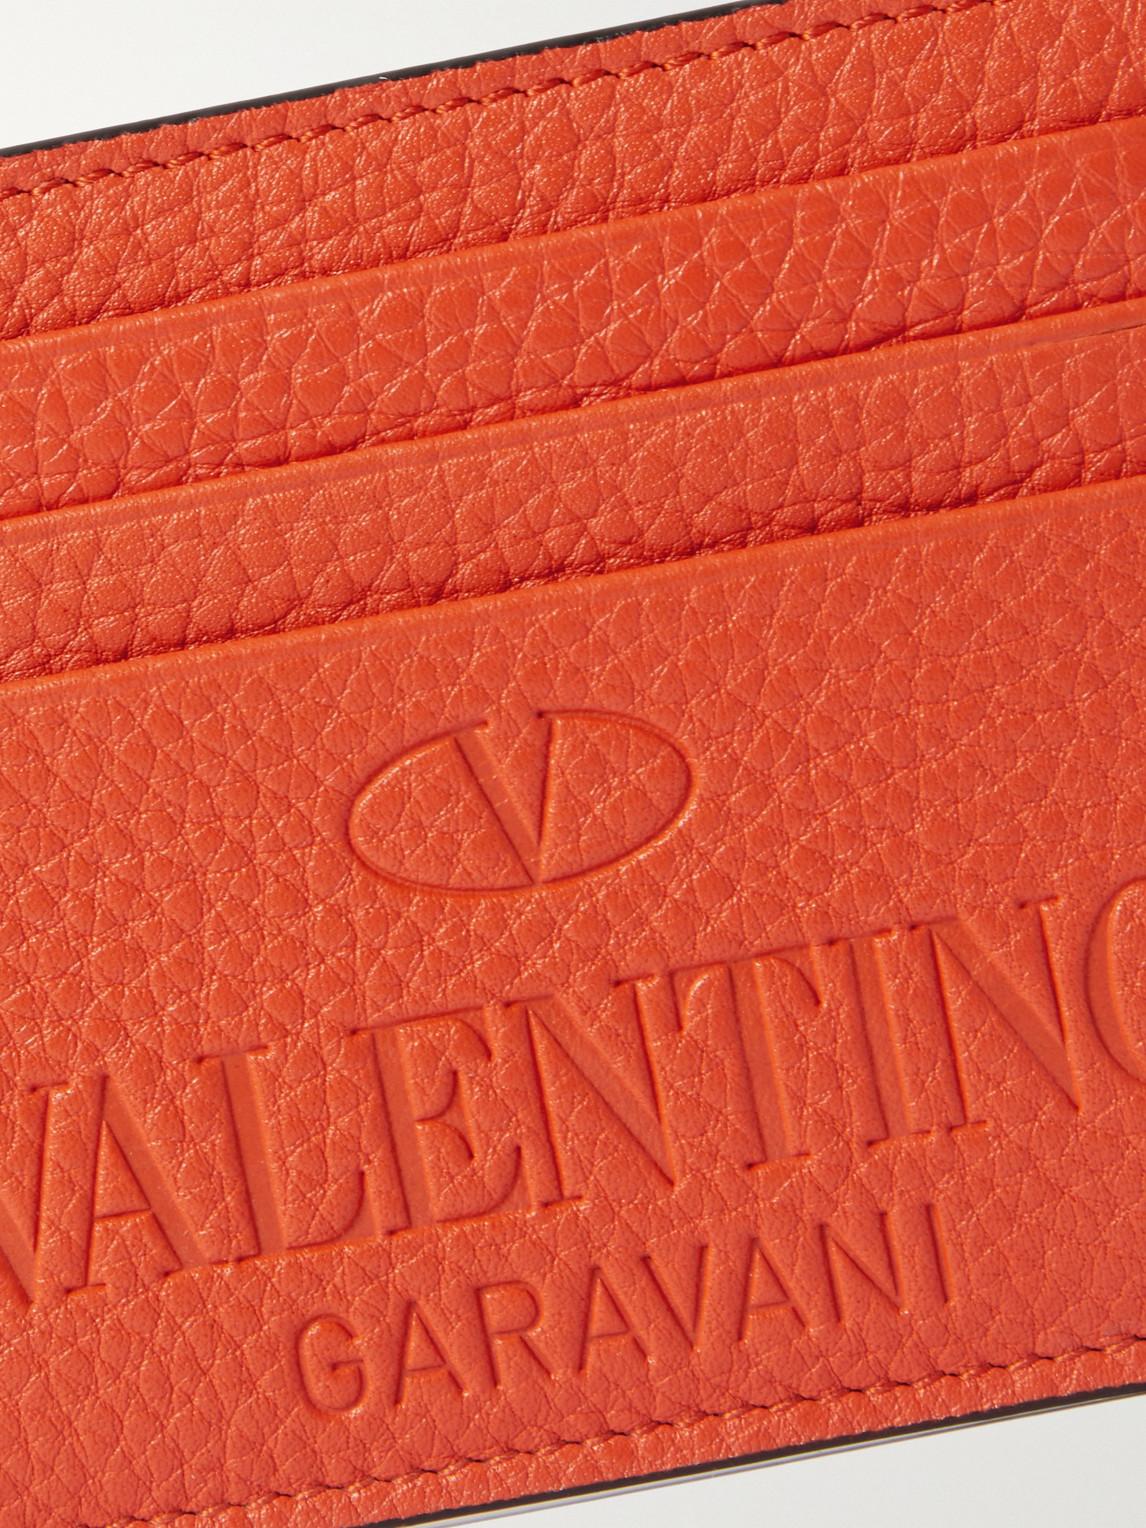 VALENTINO Cardholders VALENTINO GARAVANI LOGO-DEBOSSED FULL-GRAIN LEATHER CARDHOLDER